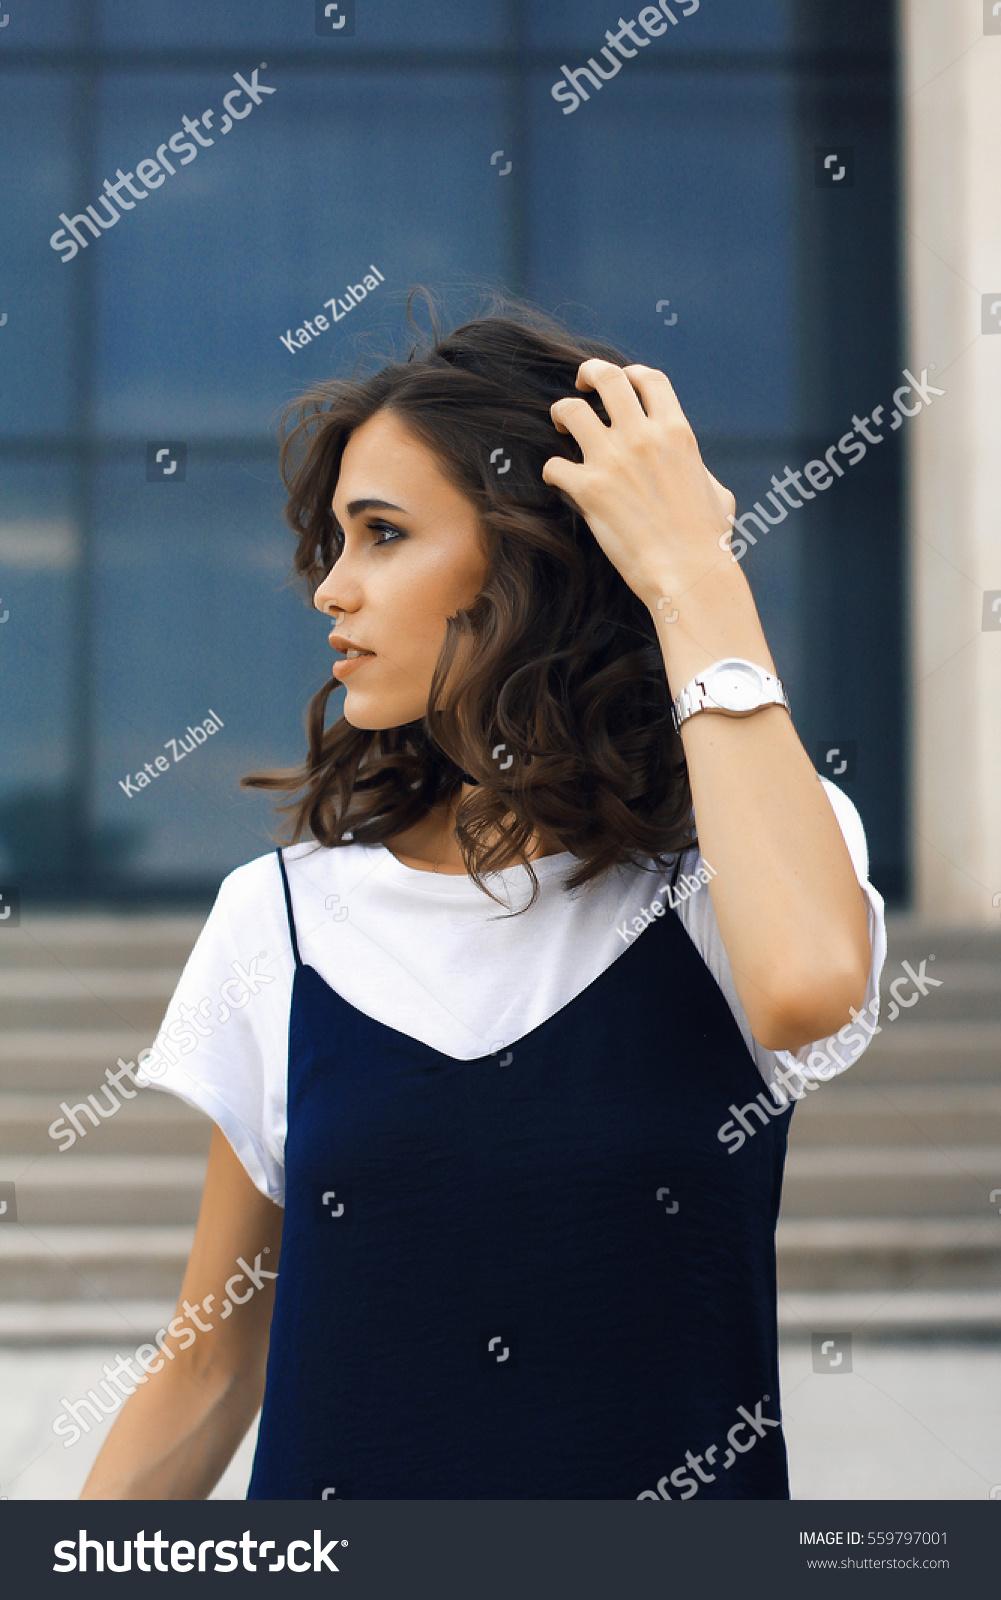 Woman Short Dark Curly Hair Hand Stock Photo Edit Now 559797001